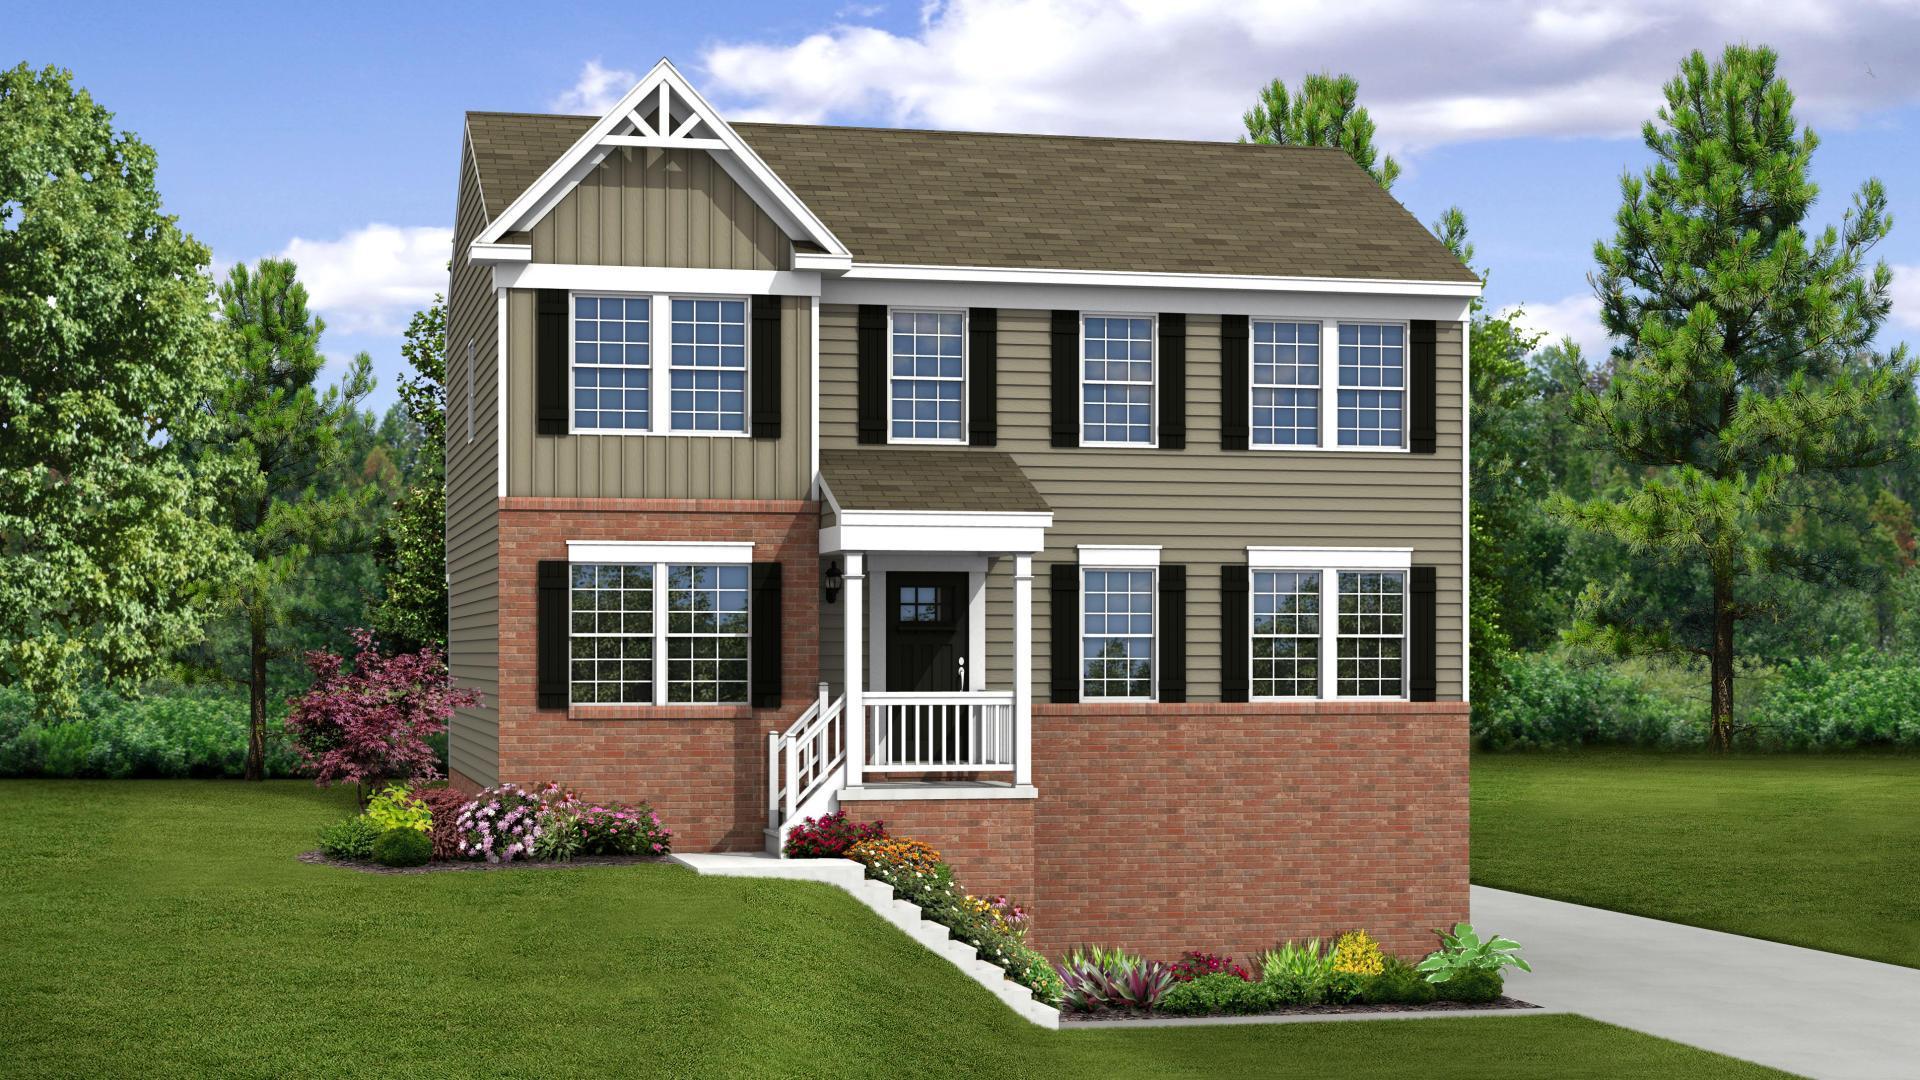 Exterior:Elevation: G Opt Victorian Inspired Facade, Porch, & Side Garage